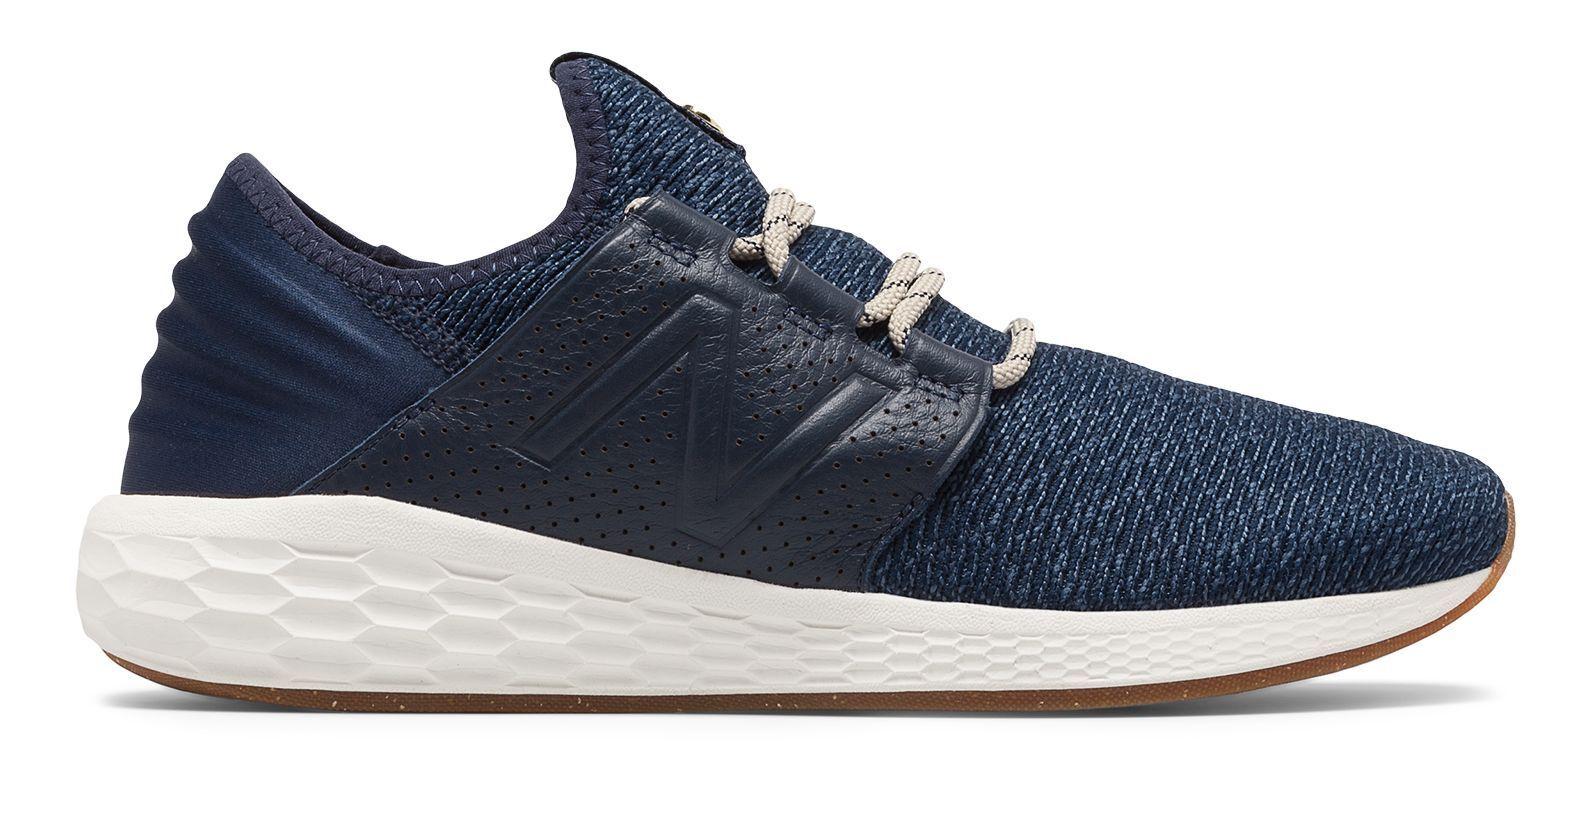 New Half Balance Men's Fresh Foam Cruz v2 Brooklyn Half New Shoes Navy with White a8cc4a